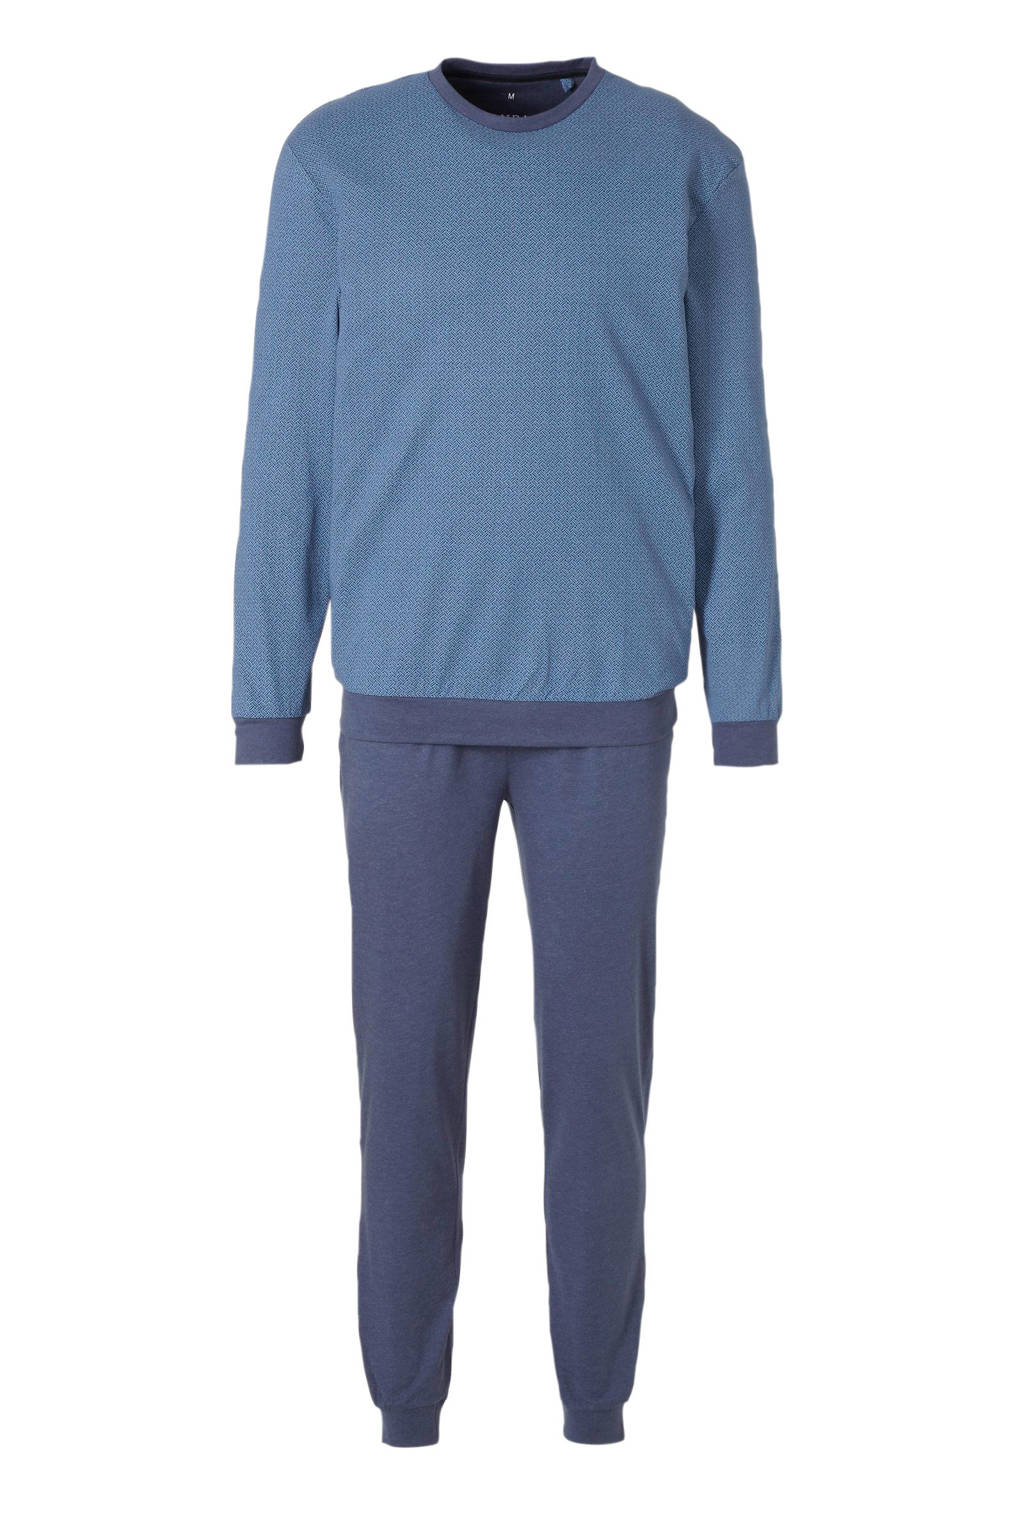 C&A Canda pyjama blauw, Blauw